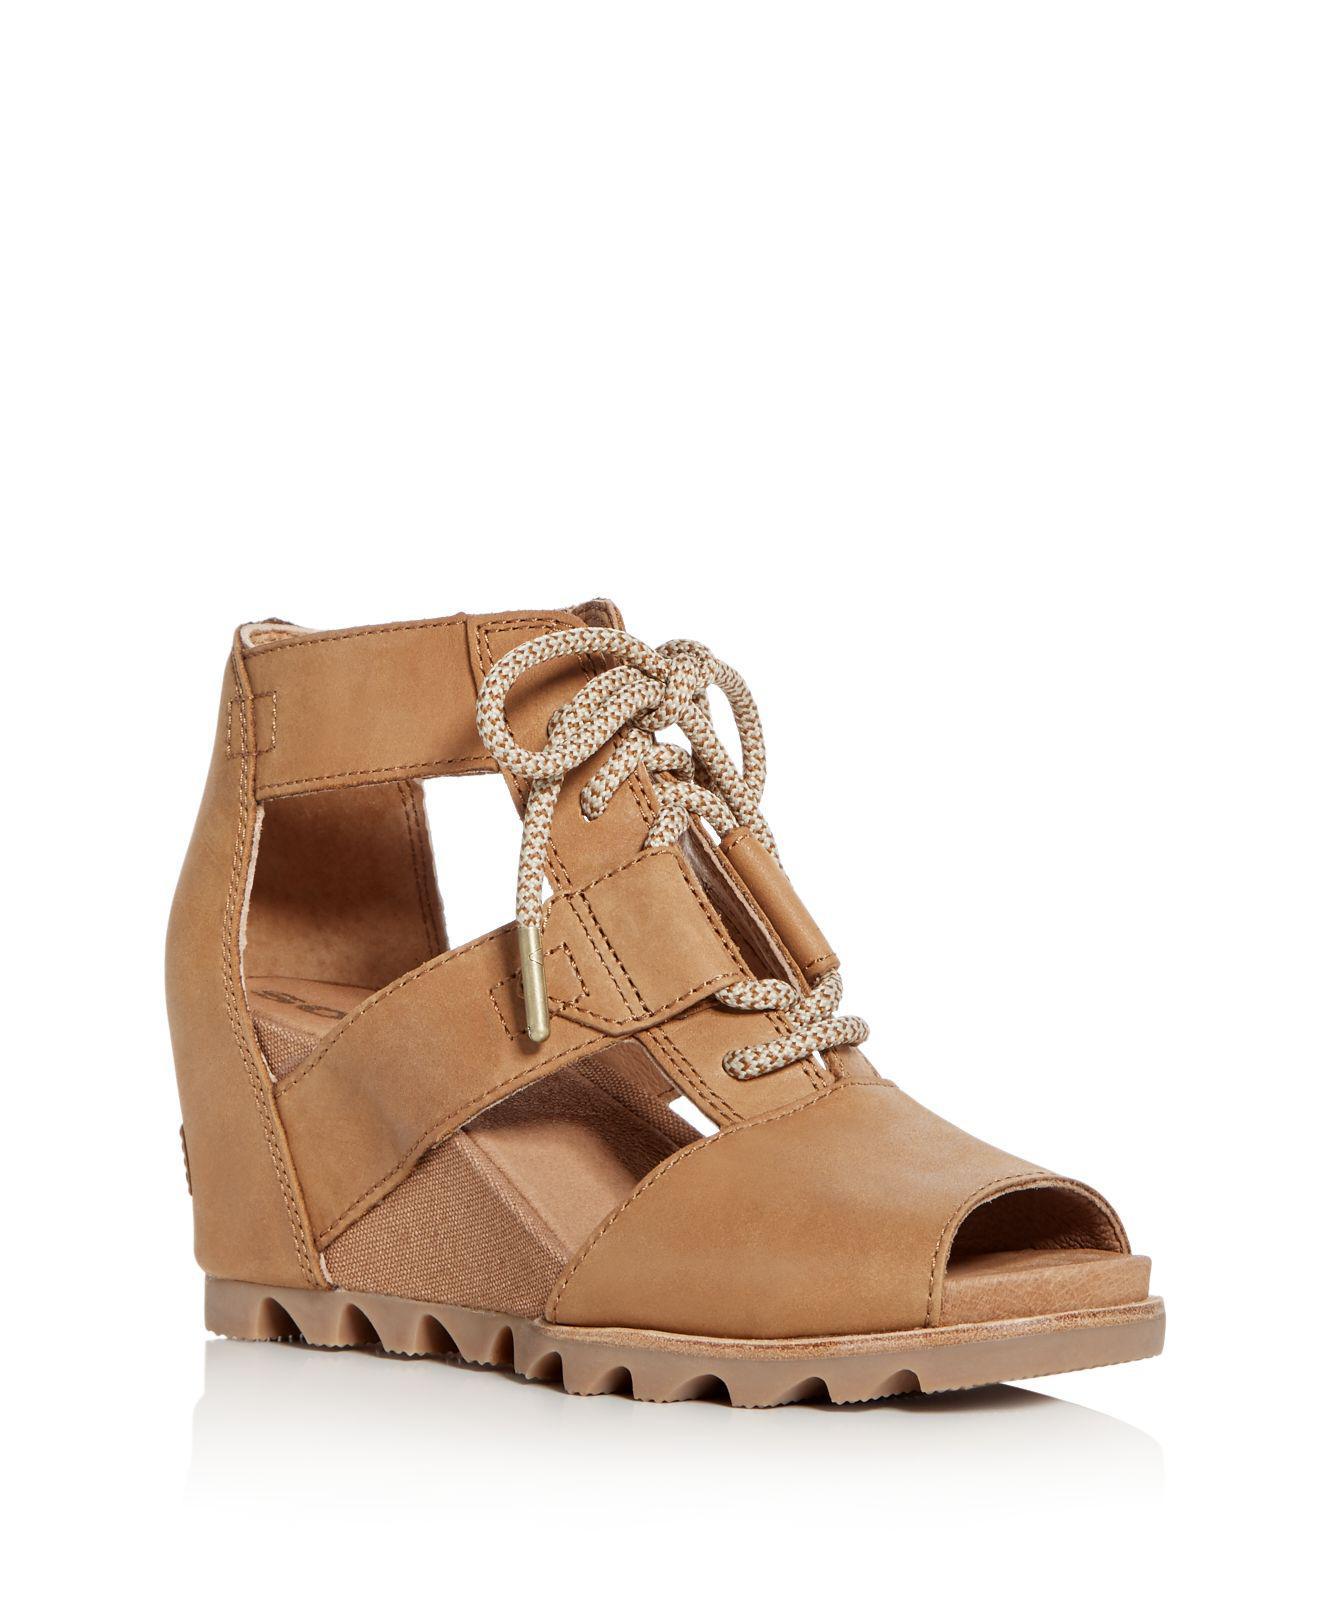 sorel Women's Joanie Nubuck Leather Platform Wedge Sandals yqSCN